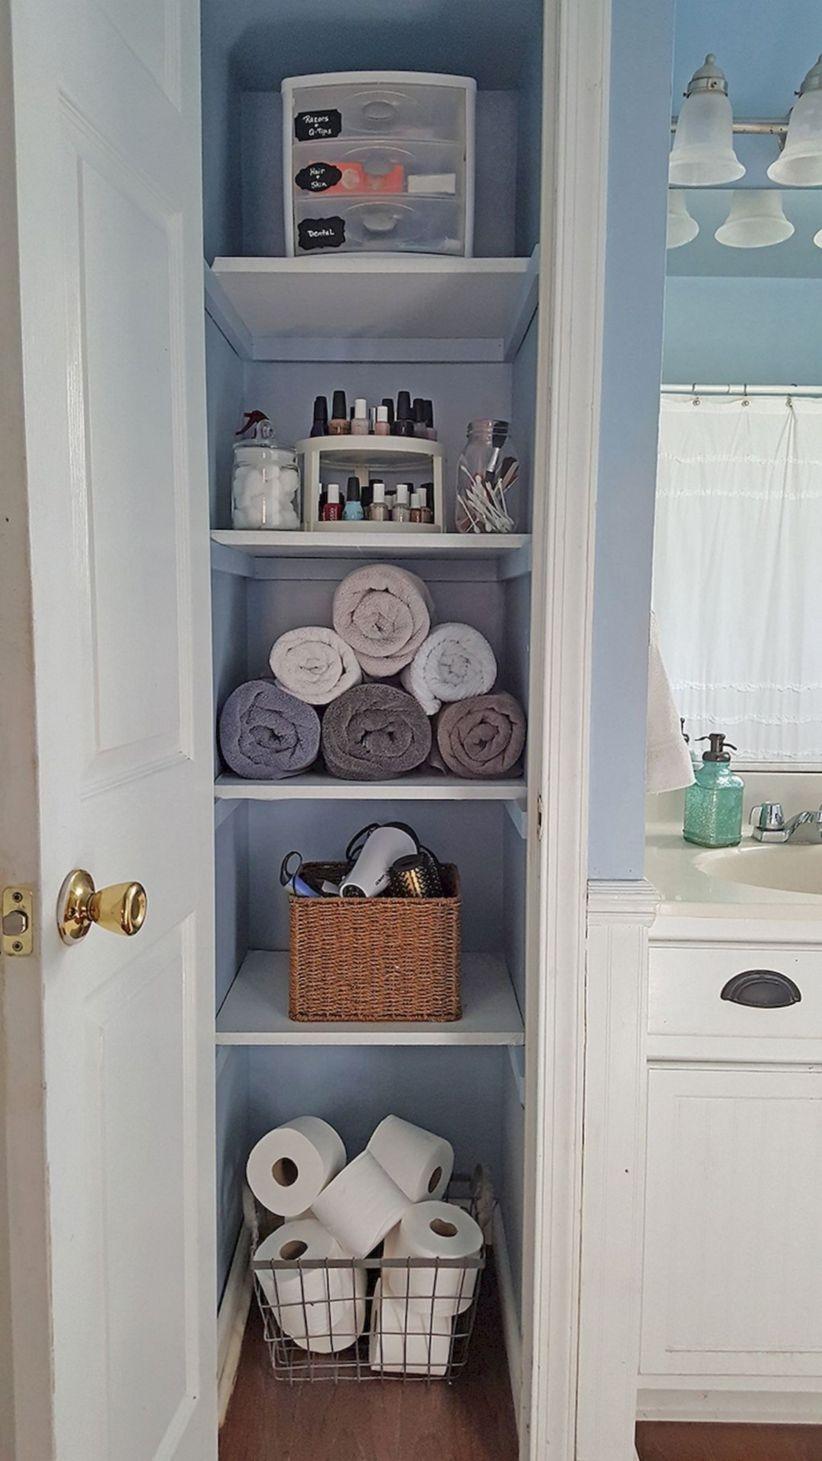 simple-and-easy-diy-storage-ideas-for-amazing-bathroom-05-1 Closet In Bathroom Design Small Spaces on basic closet design, lowe's closet design, room closet design, furniture closet design, small closet ideas, simple closet design, small closet remodel, small designer bathrooms, desk closet design, contemporary closet design, bathroom sink closet design, men's closet design, corner closet design, bathroom with closet design, small closet layouts, home closet design, bed in closet design, long narrow closet design,